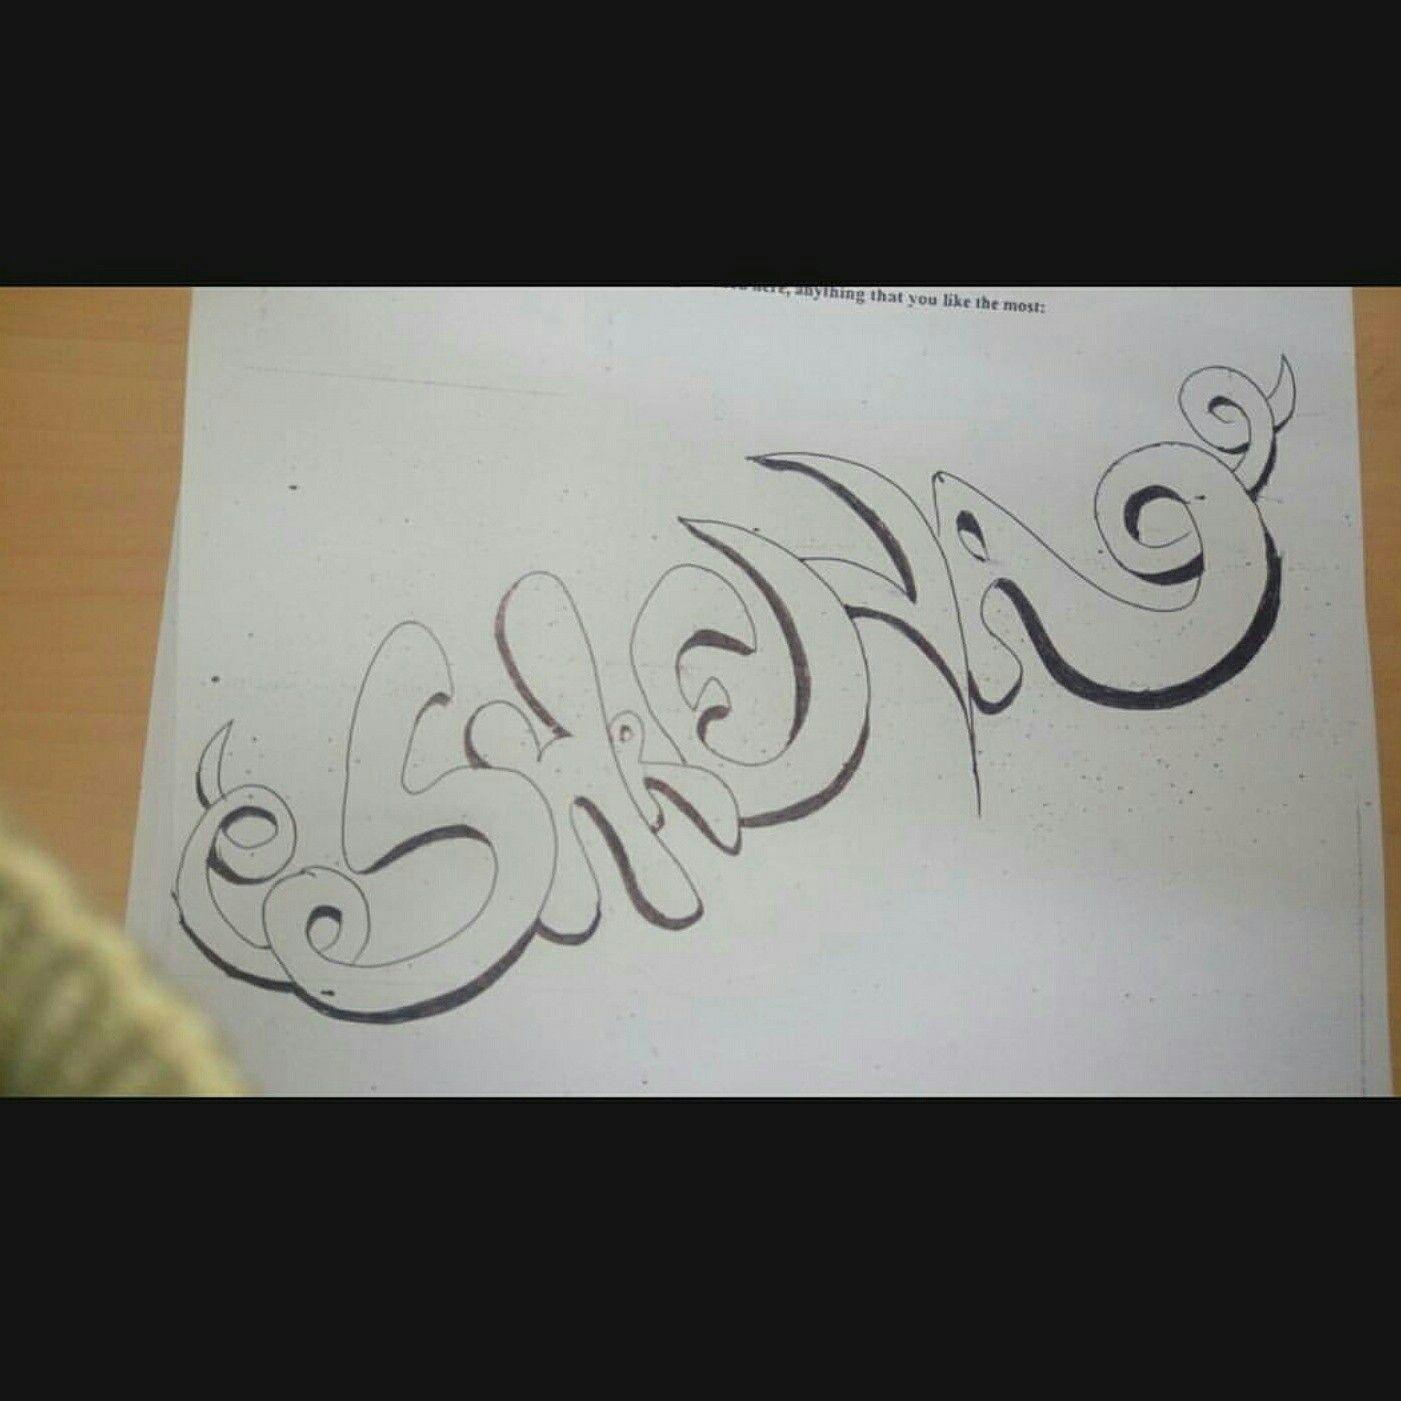 Calligraphy pencil art shreya by shreya kalra